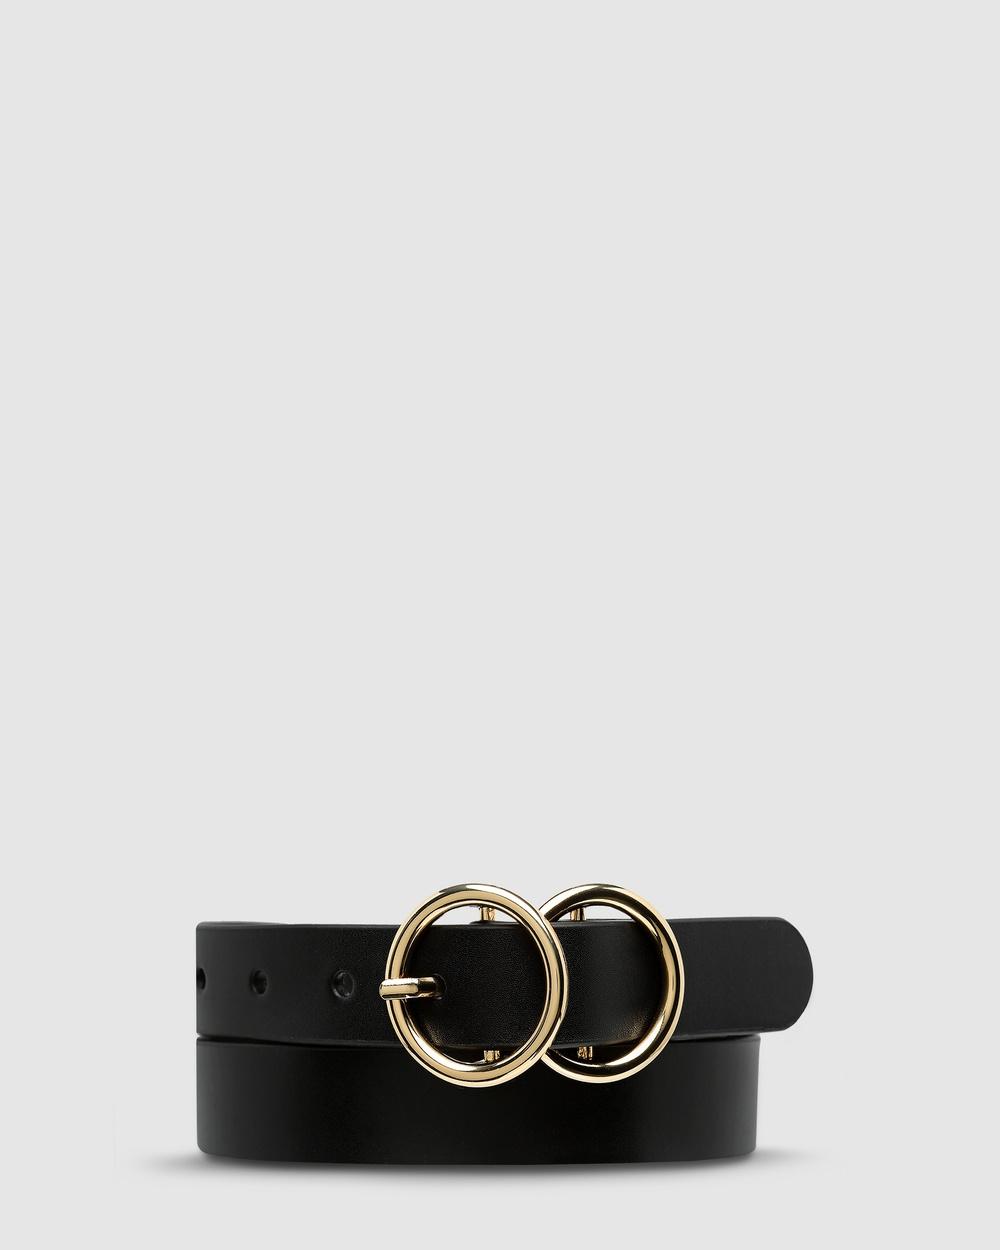 Status Anxiety Mislaid Skinny Belt Belts Black/Gold